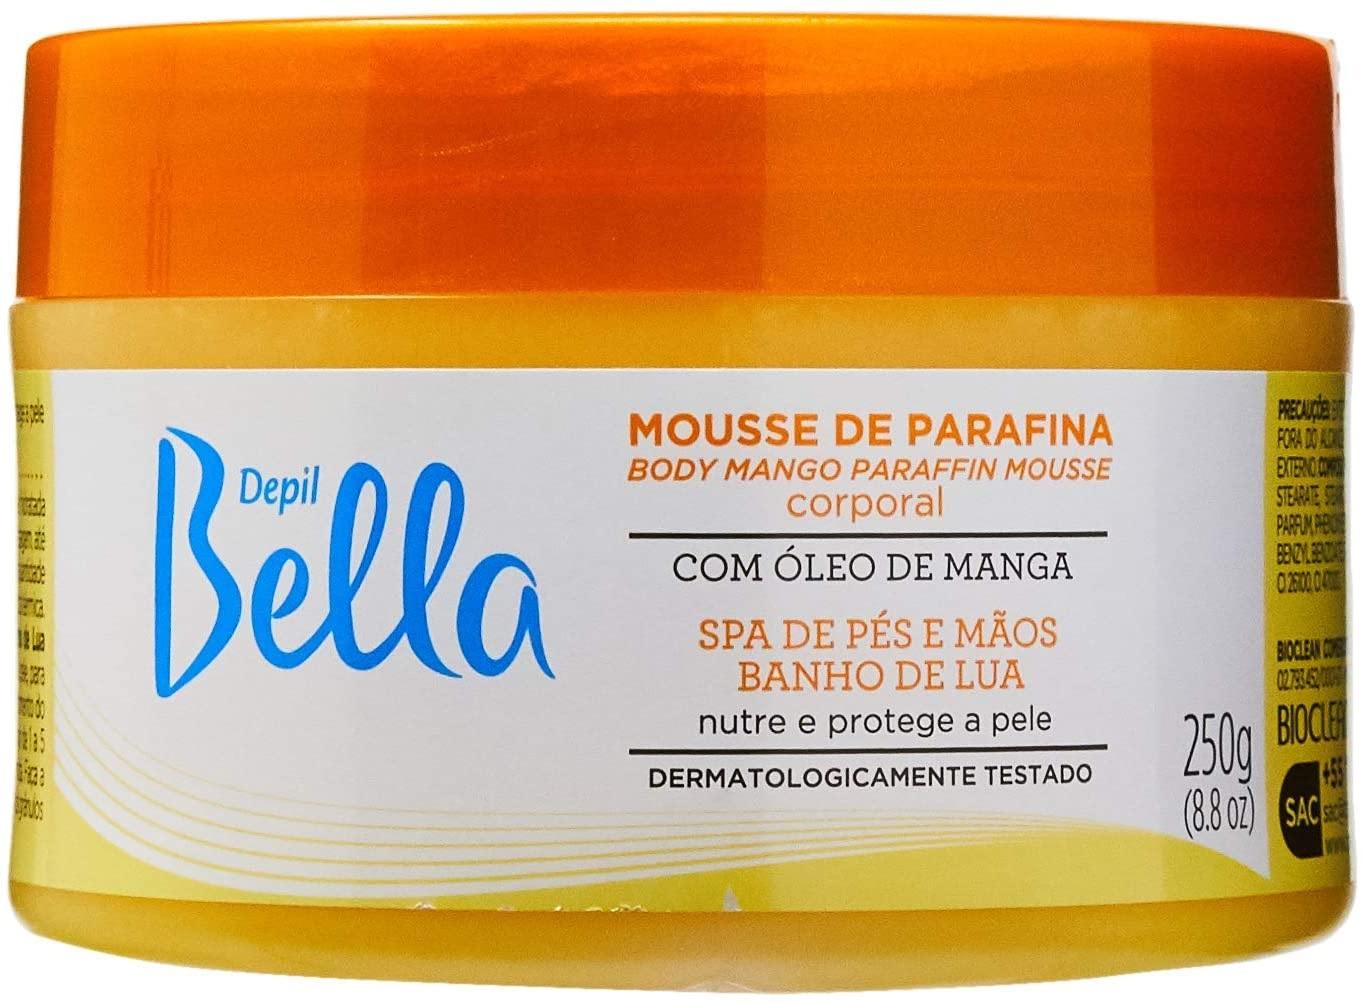 Mousse De Parafina Corporal Depil Bella Com Oleo De Manga 250G